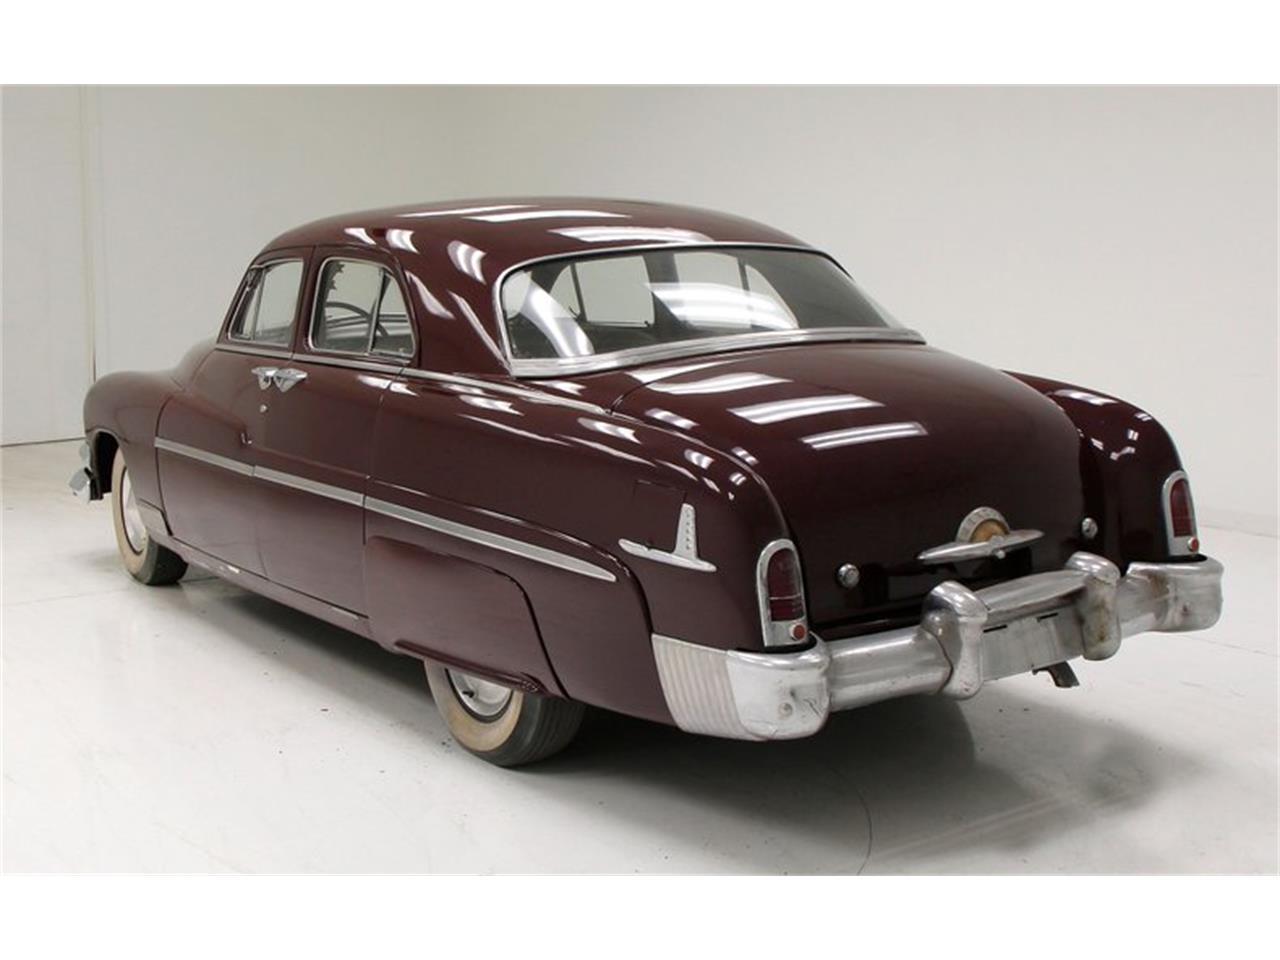 1951 Mercury Sedan (CC-1321496) for sale in Morgantown, Pennsylvania